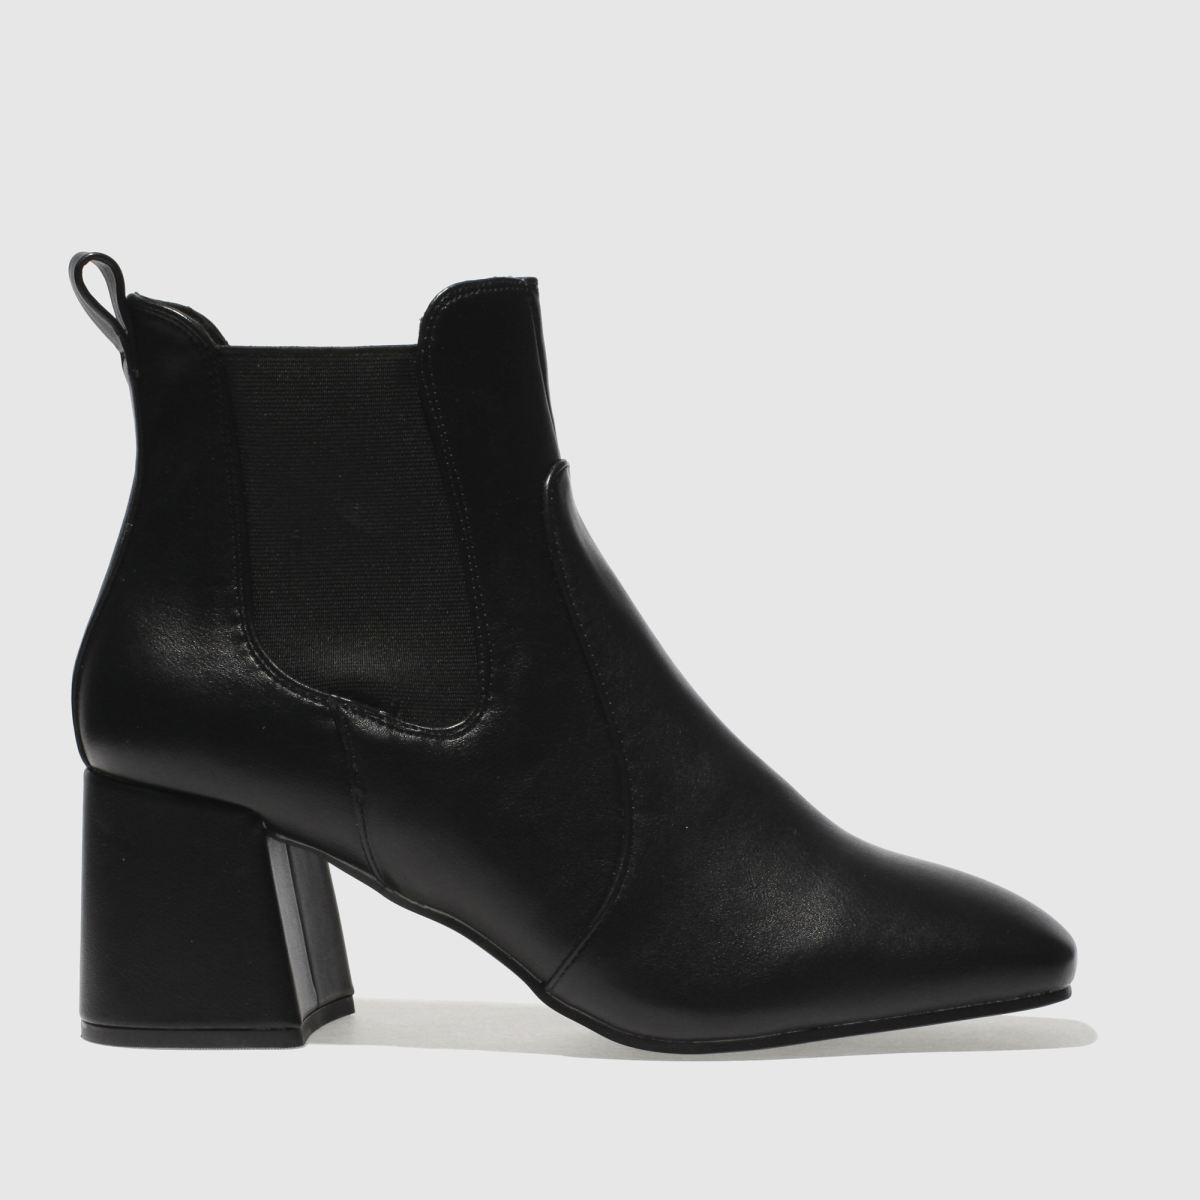 Schuh Black Fresh Boots